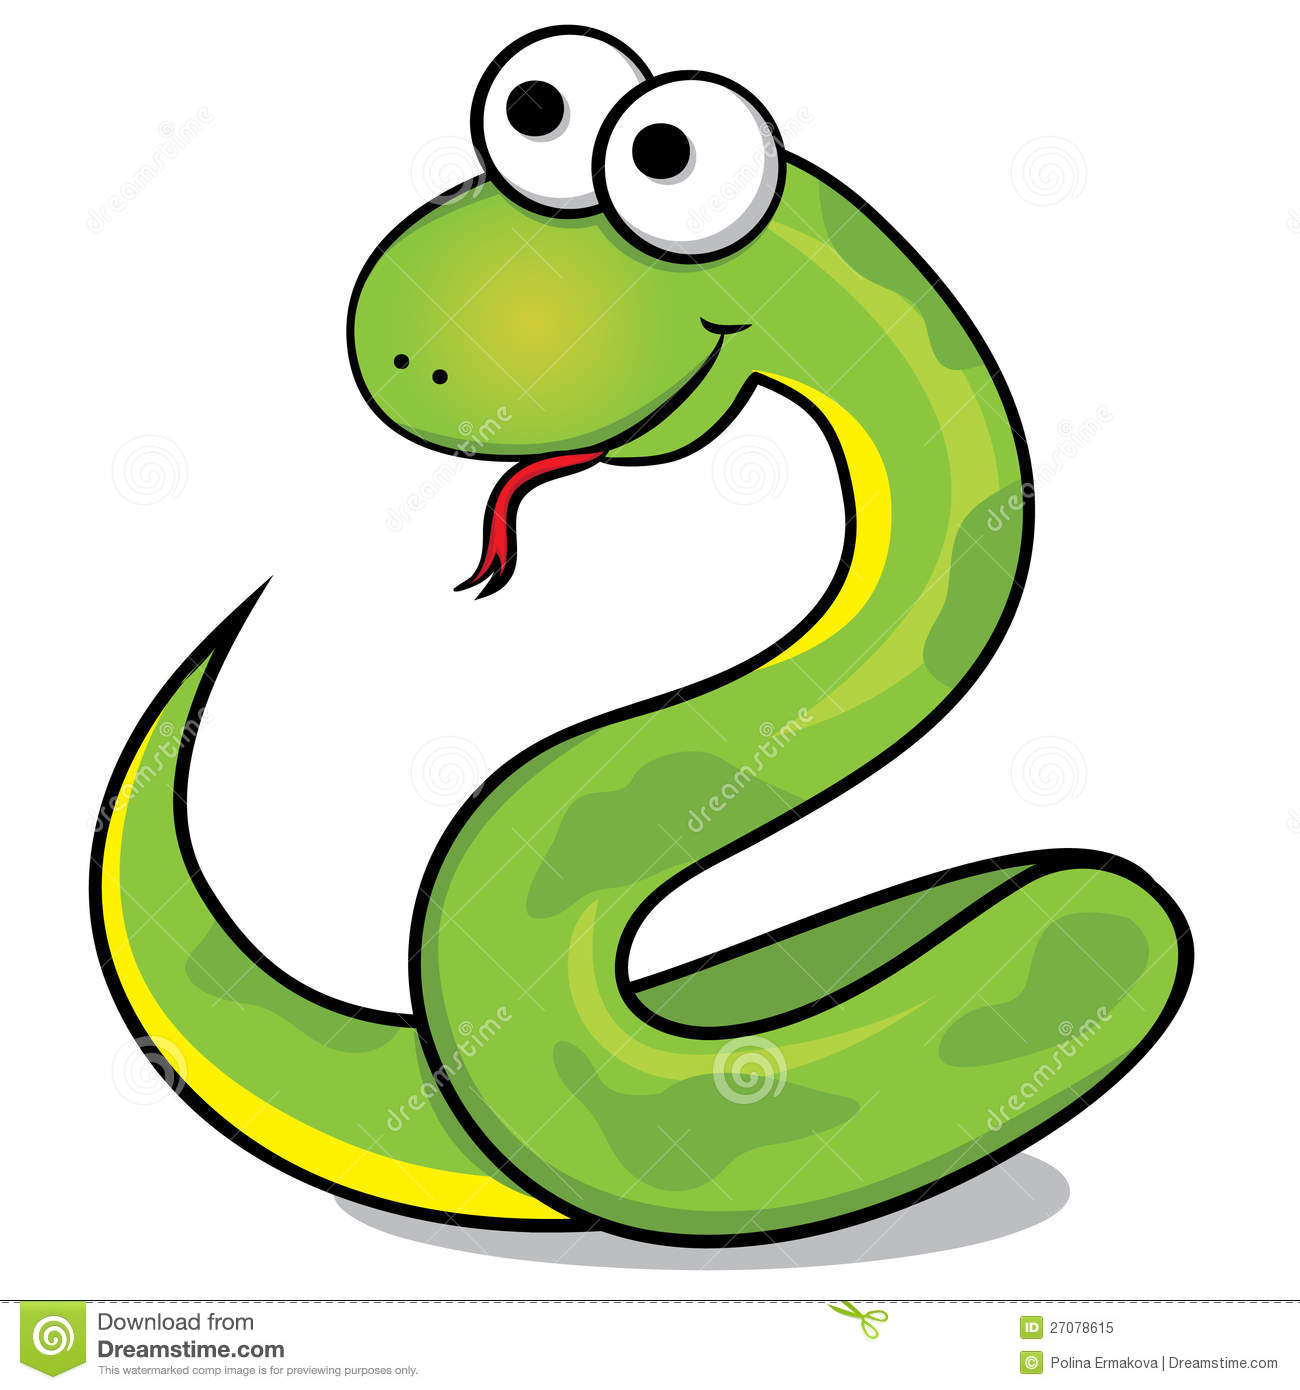 Mask clipart snake Clipart Panda snake%20clipart Clipart Art